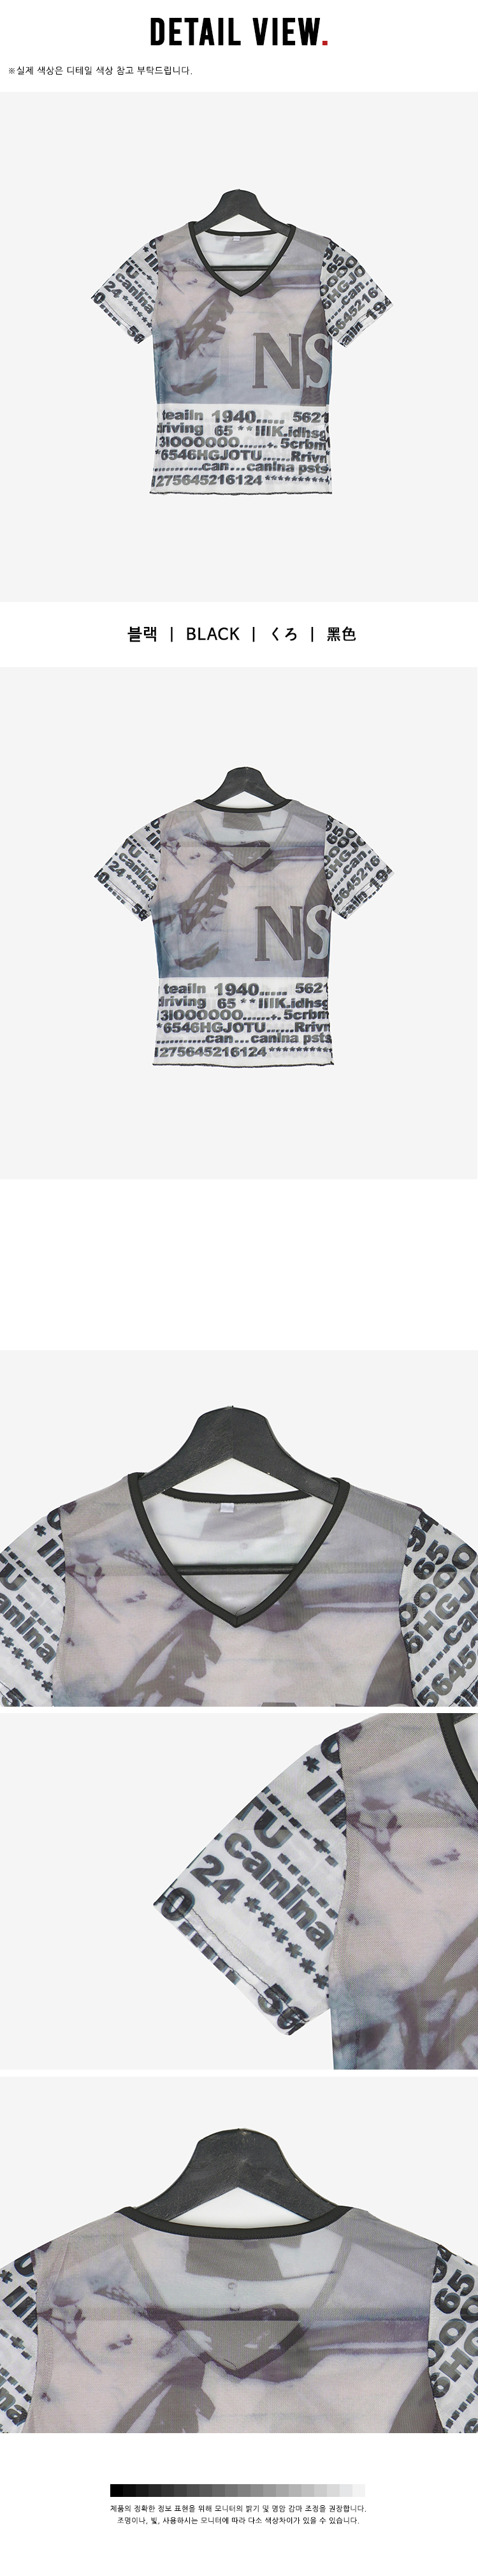 Appron Printing See-through Short Sleeve Tee